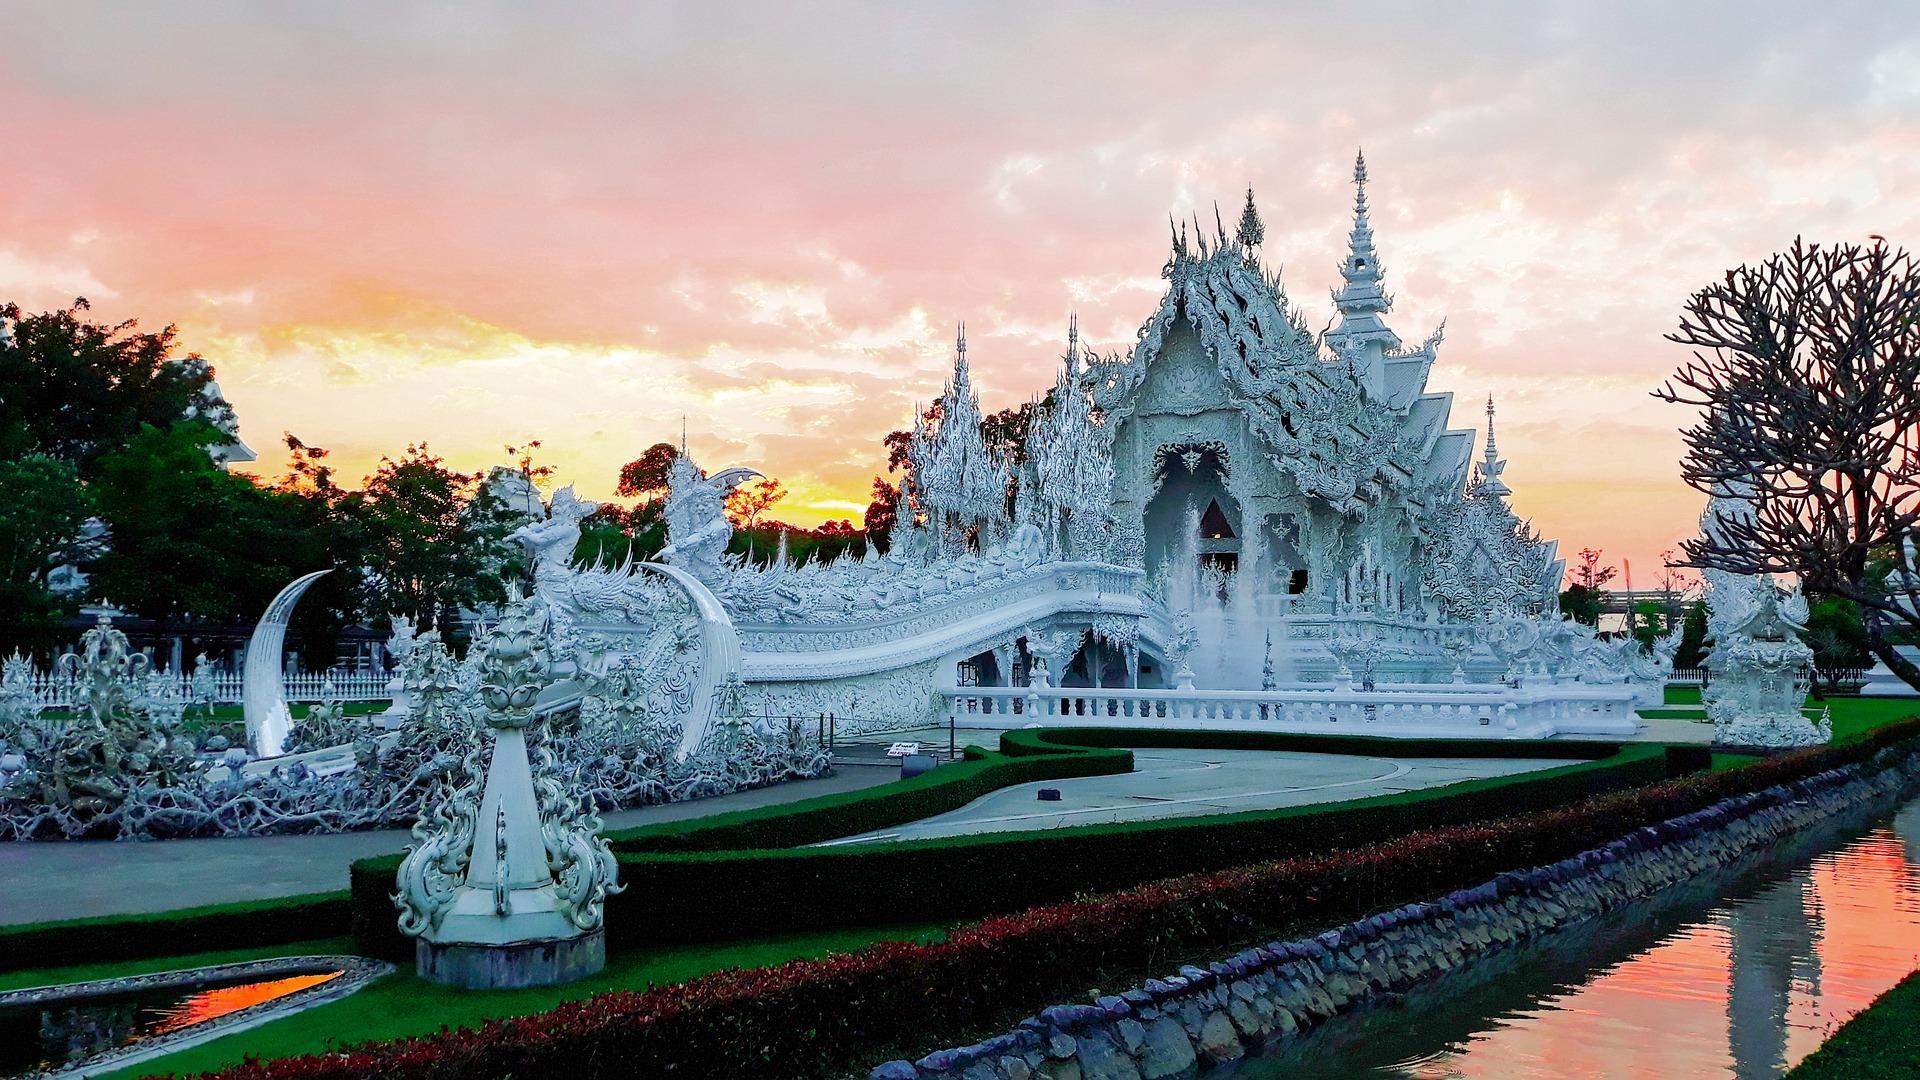 /optitravel/online/www/layout22/single_product.php?pkt_id=251&Produto=Tailândia Clássica & Phi Phi&destino=TAILÂNDIA